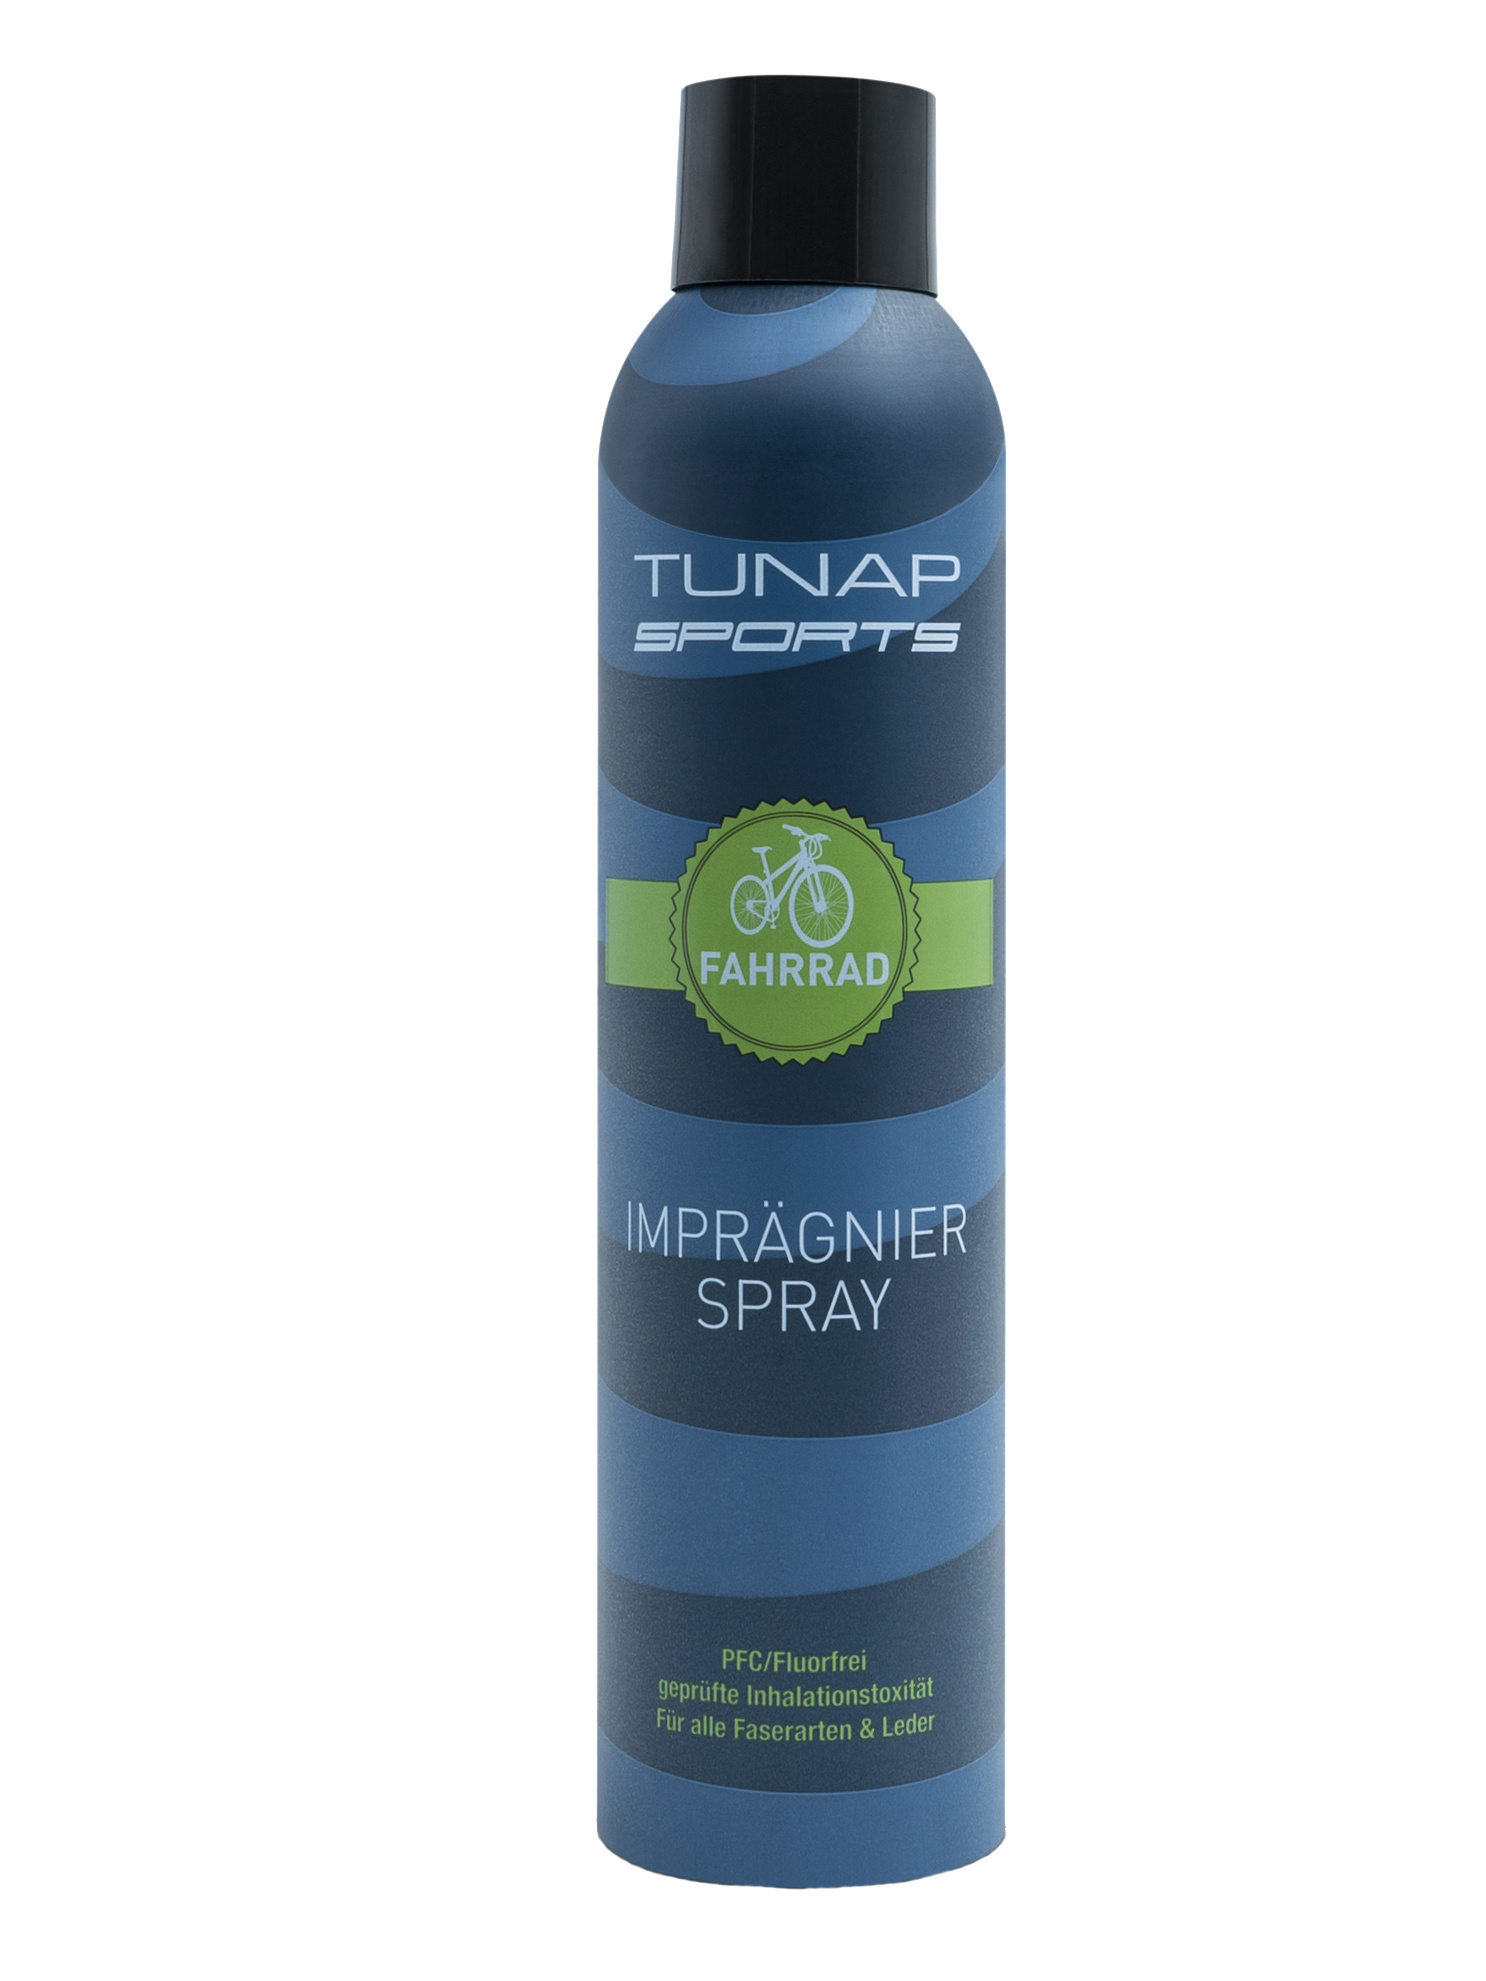 TUNAP Sports Impregneerspray (300 ml)